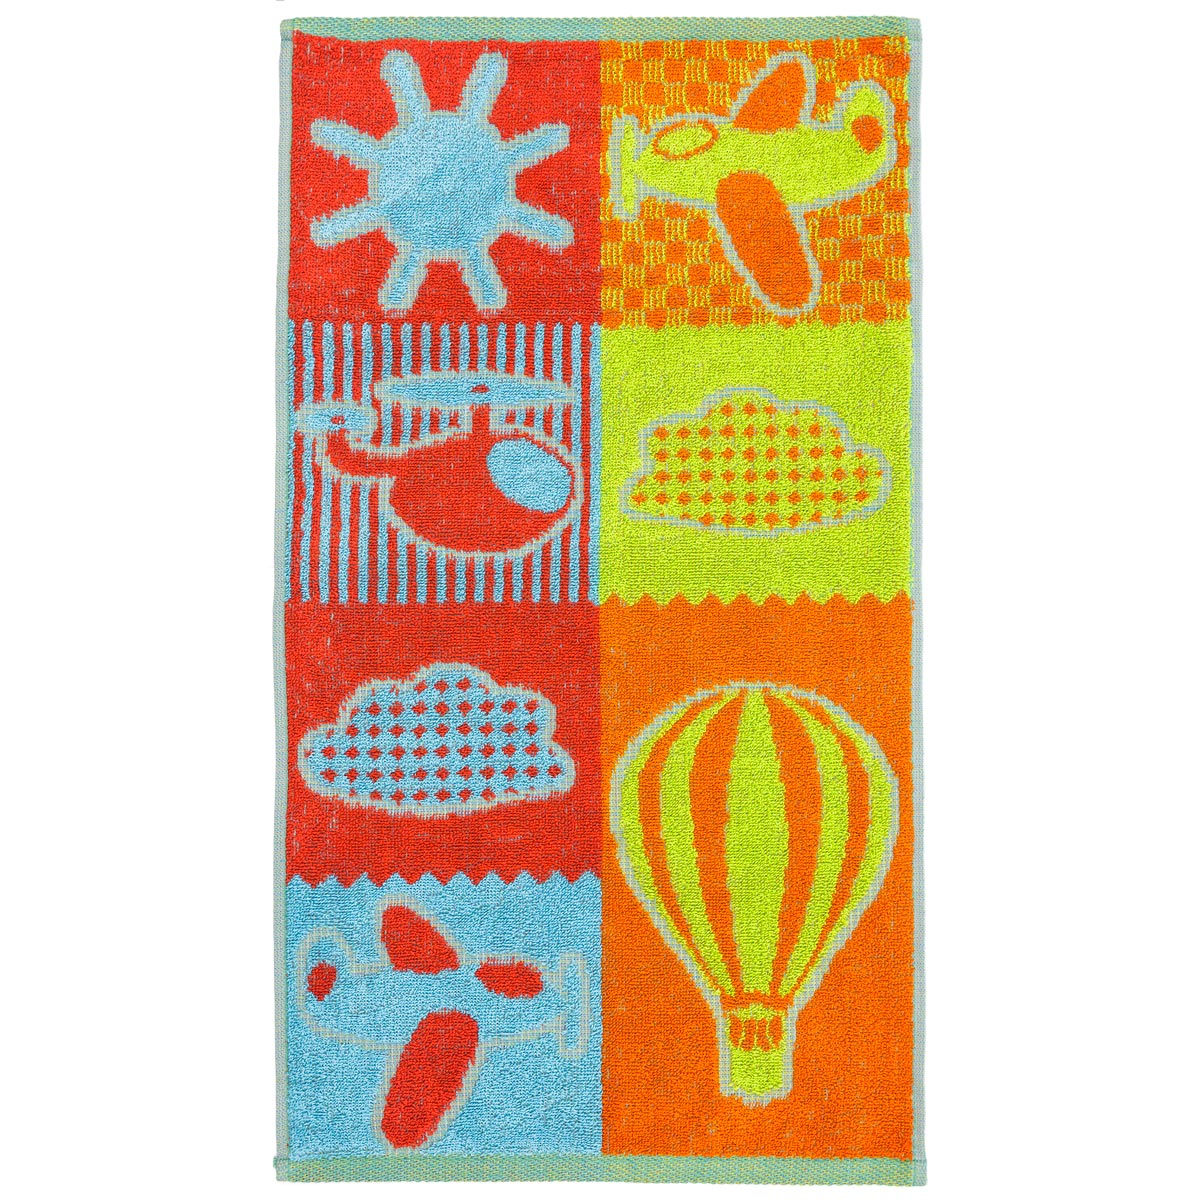 Полотенце Веселые кубики Оранжевый р. 30х60Махровые полотенца<br><br><br>Тип: Полотенце<br>Размер: 30х60<br>Материал: Махра